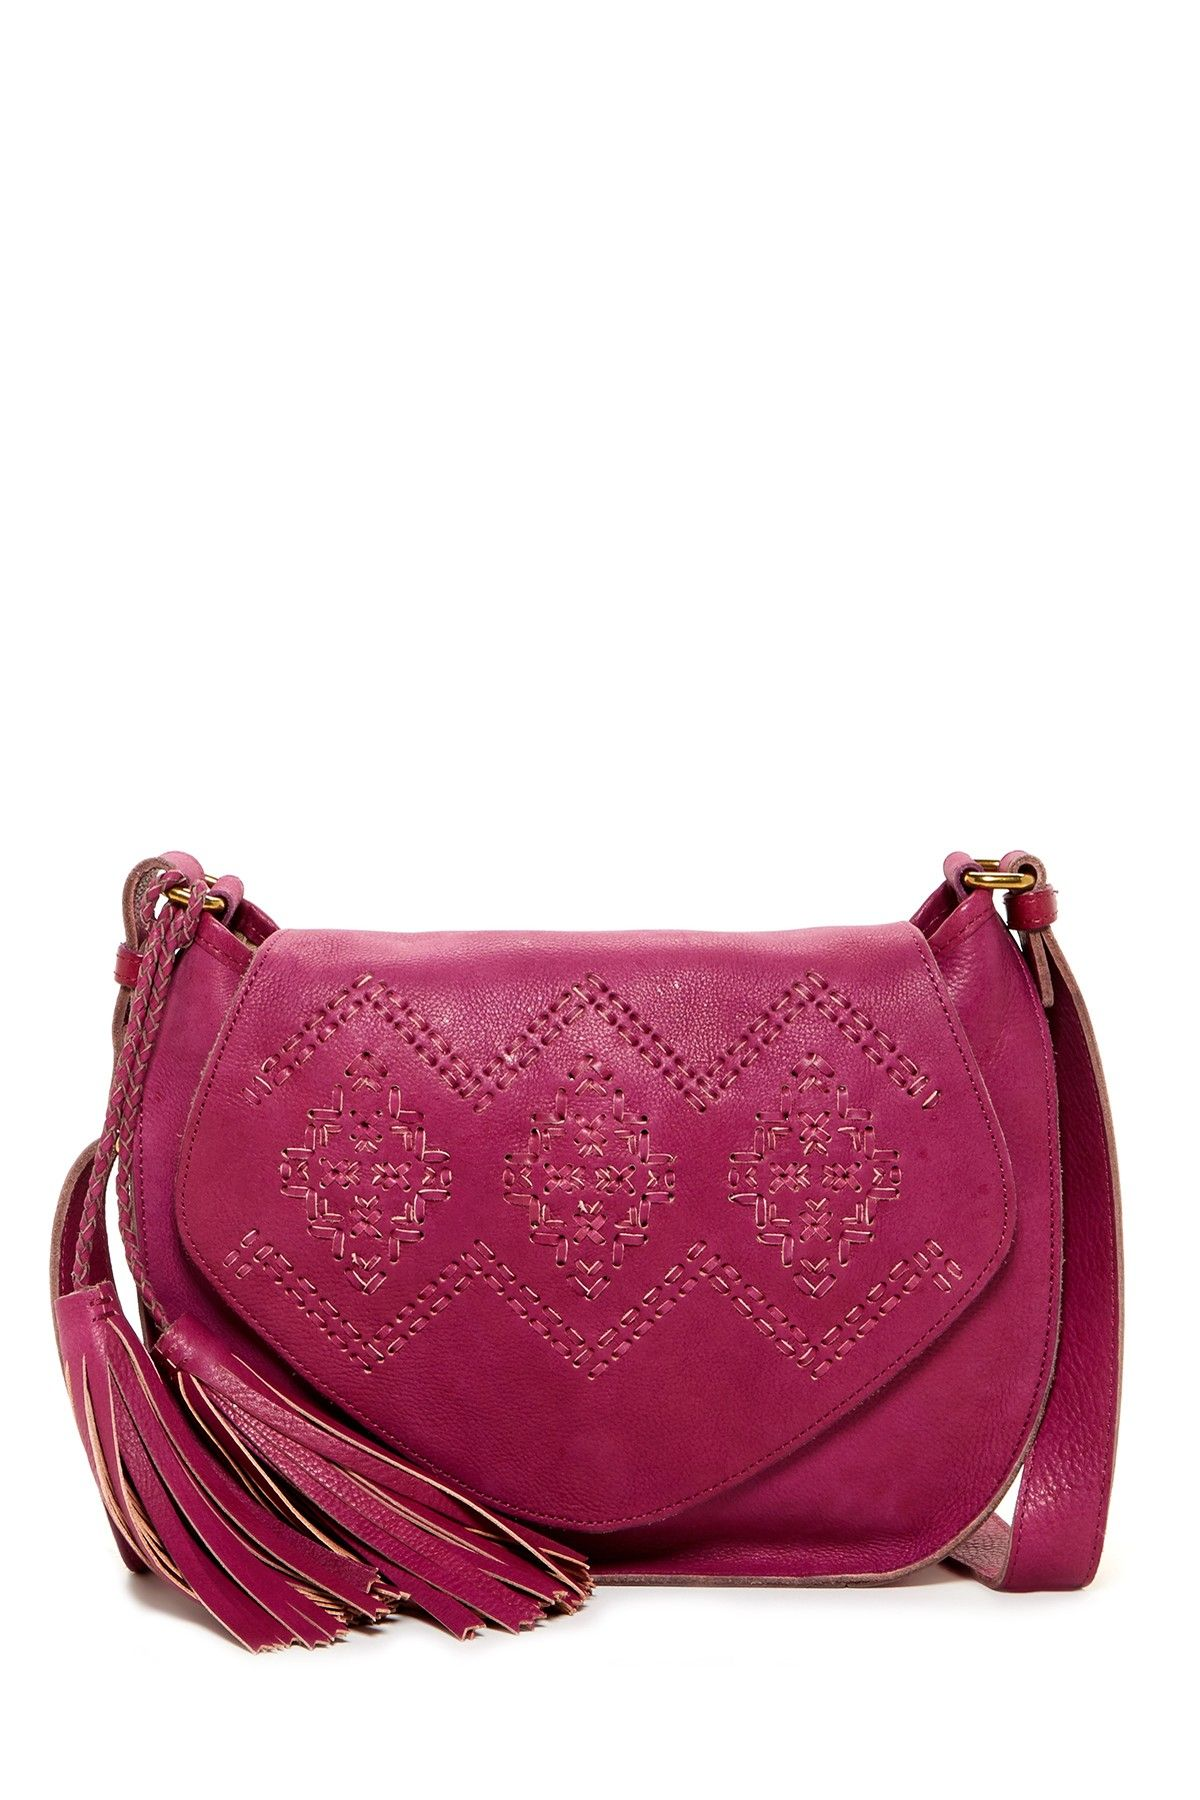 Isabella Fiore Josephina Shoulder Bag